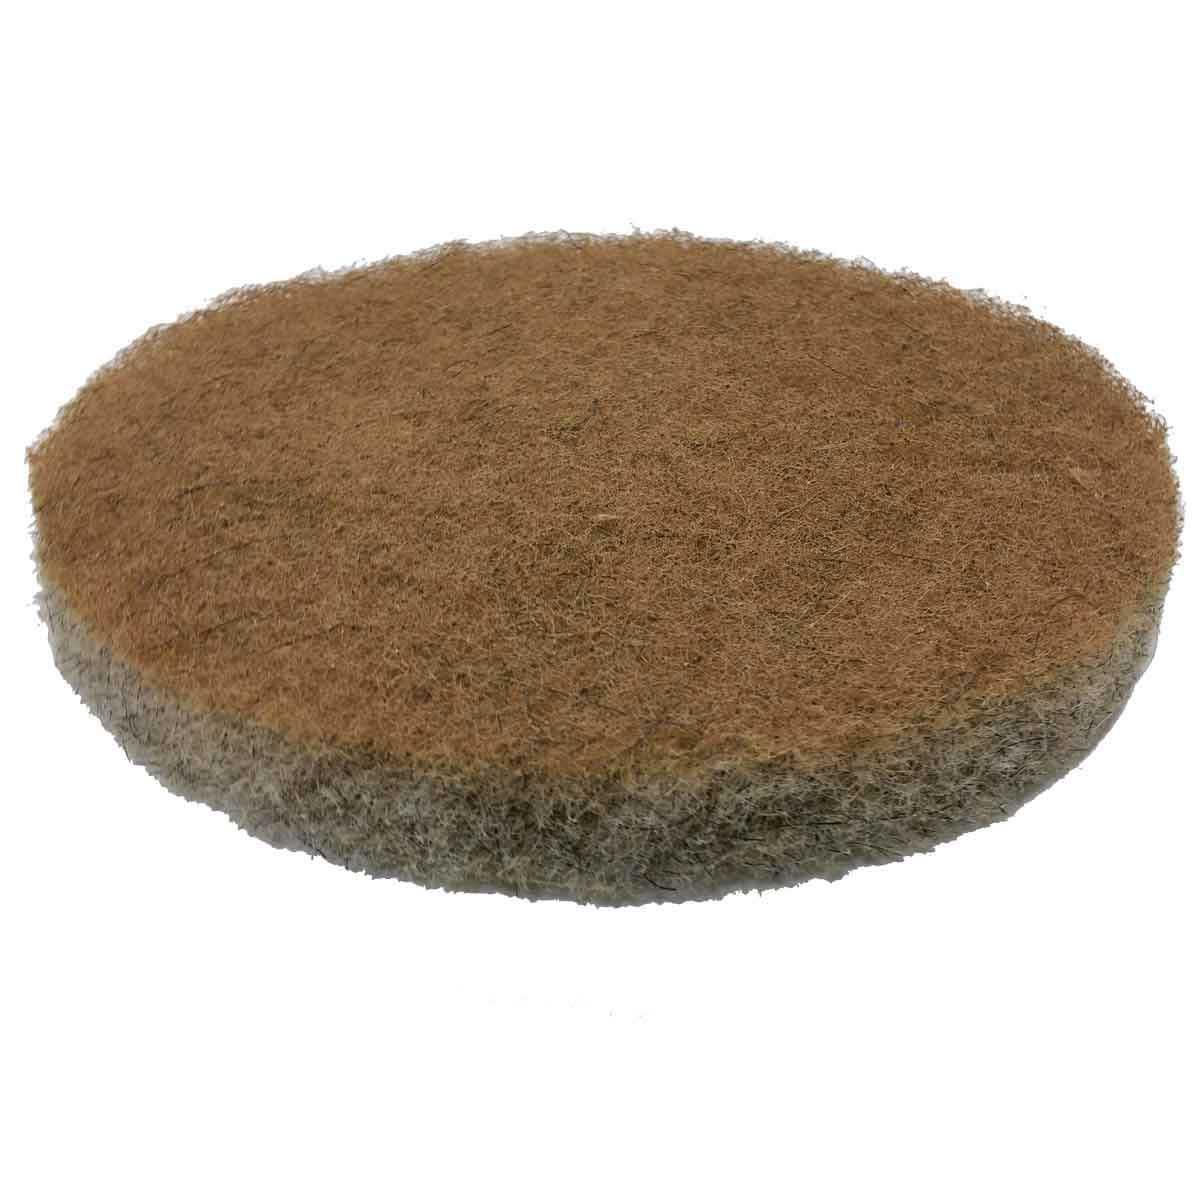 Husqvarna Hiperfloor floor pads